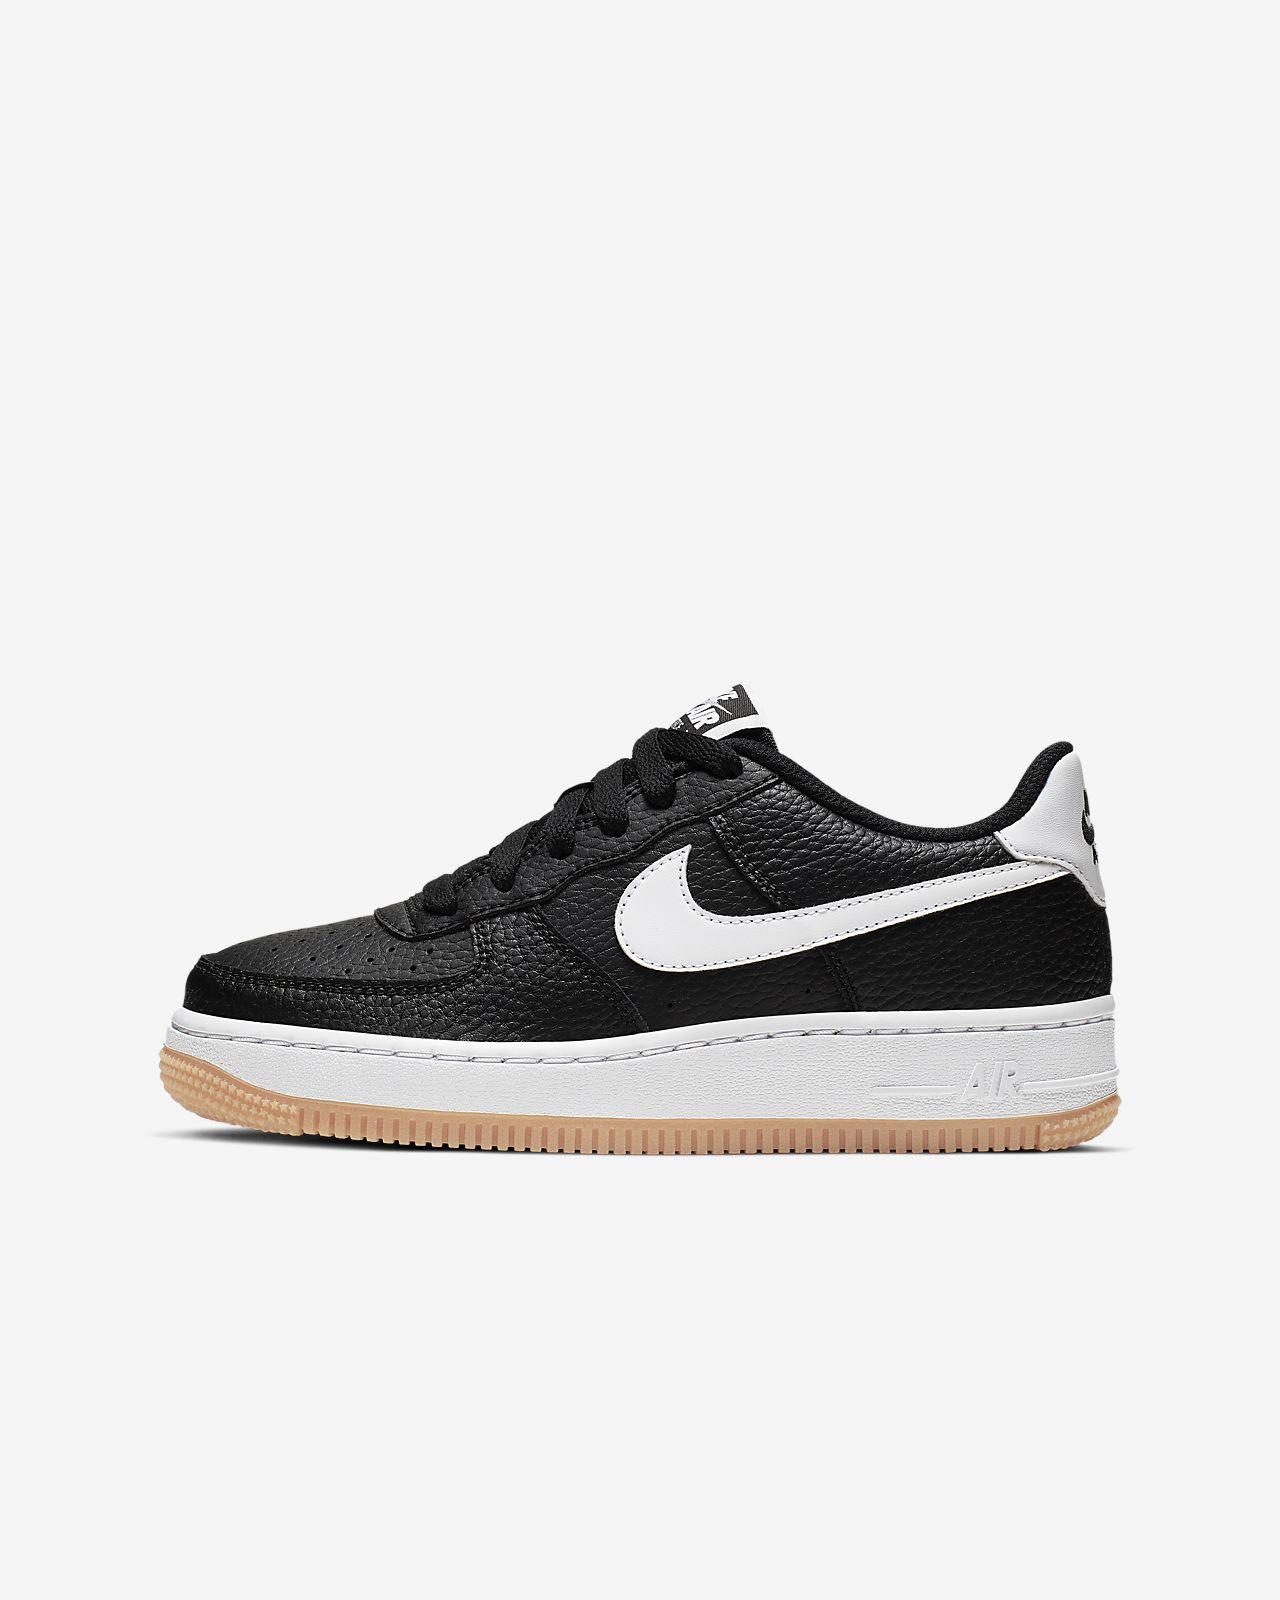 Nike Air Force 1-2 Schuh für ältere Kinder